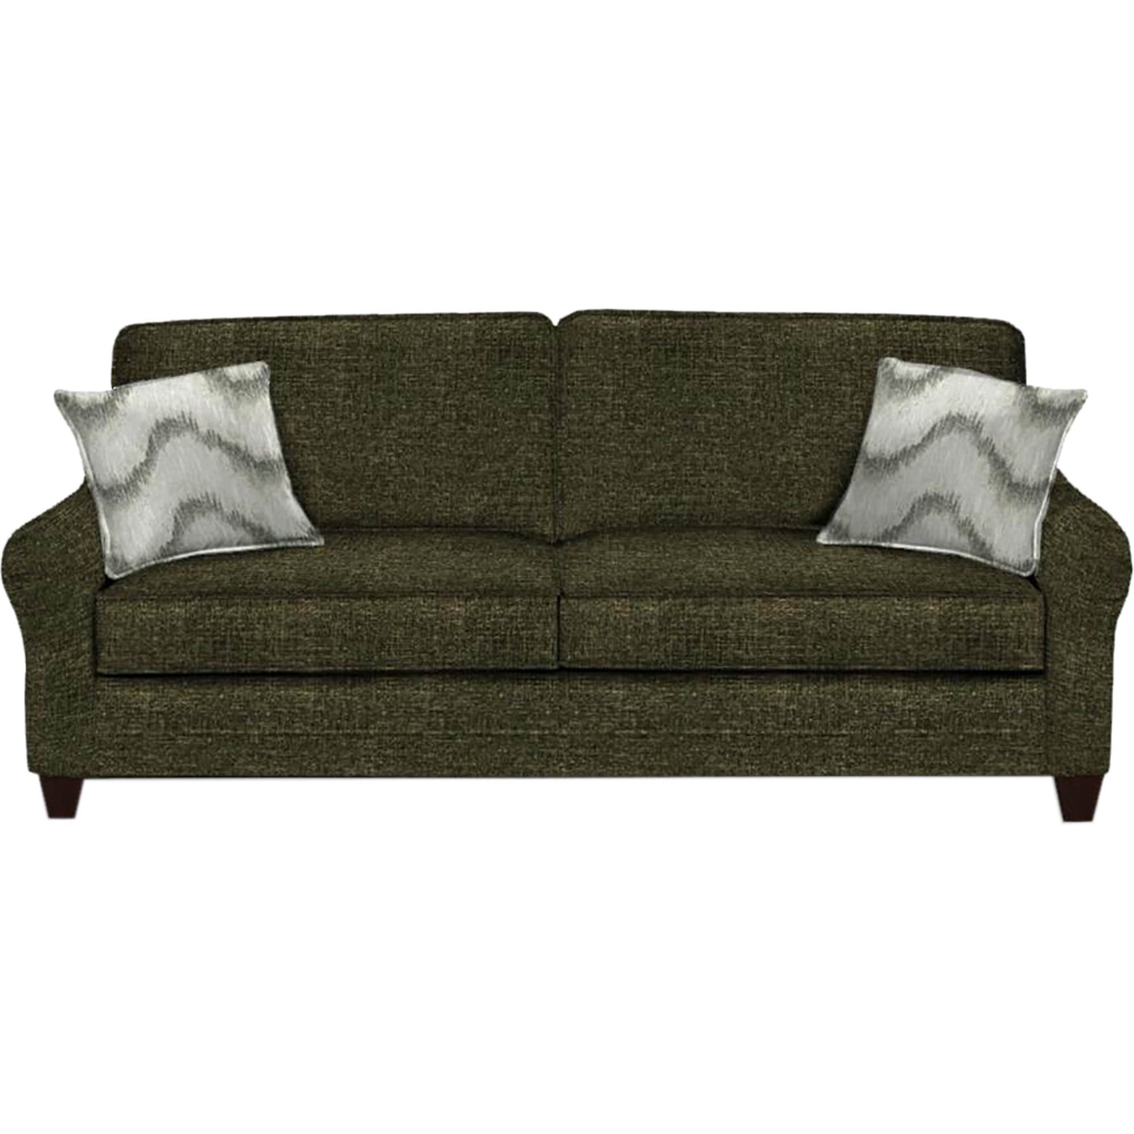 - Hgtv Home Design Studio By Bassett Charles Of London Arm Sofa